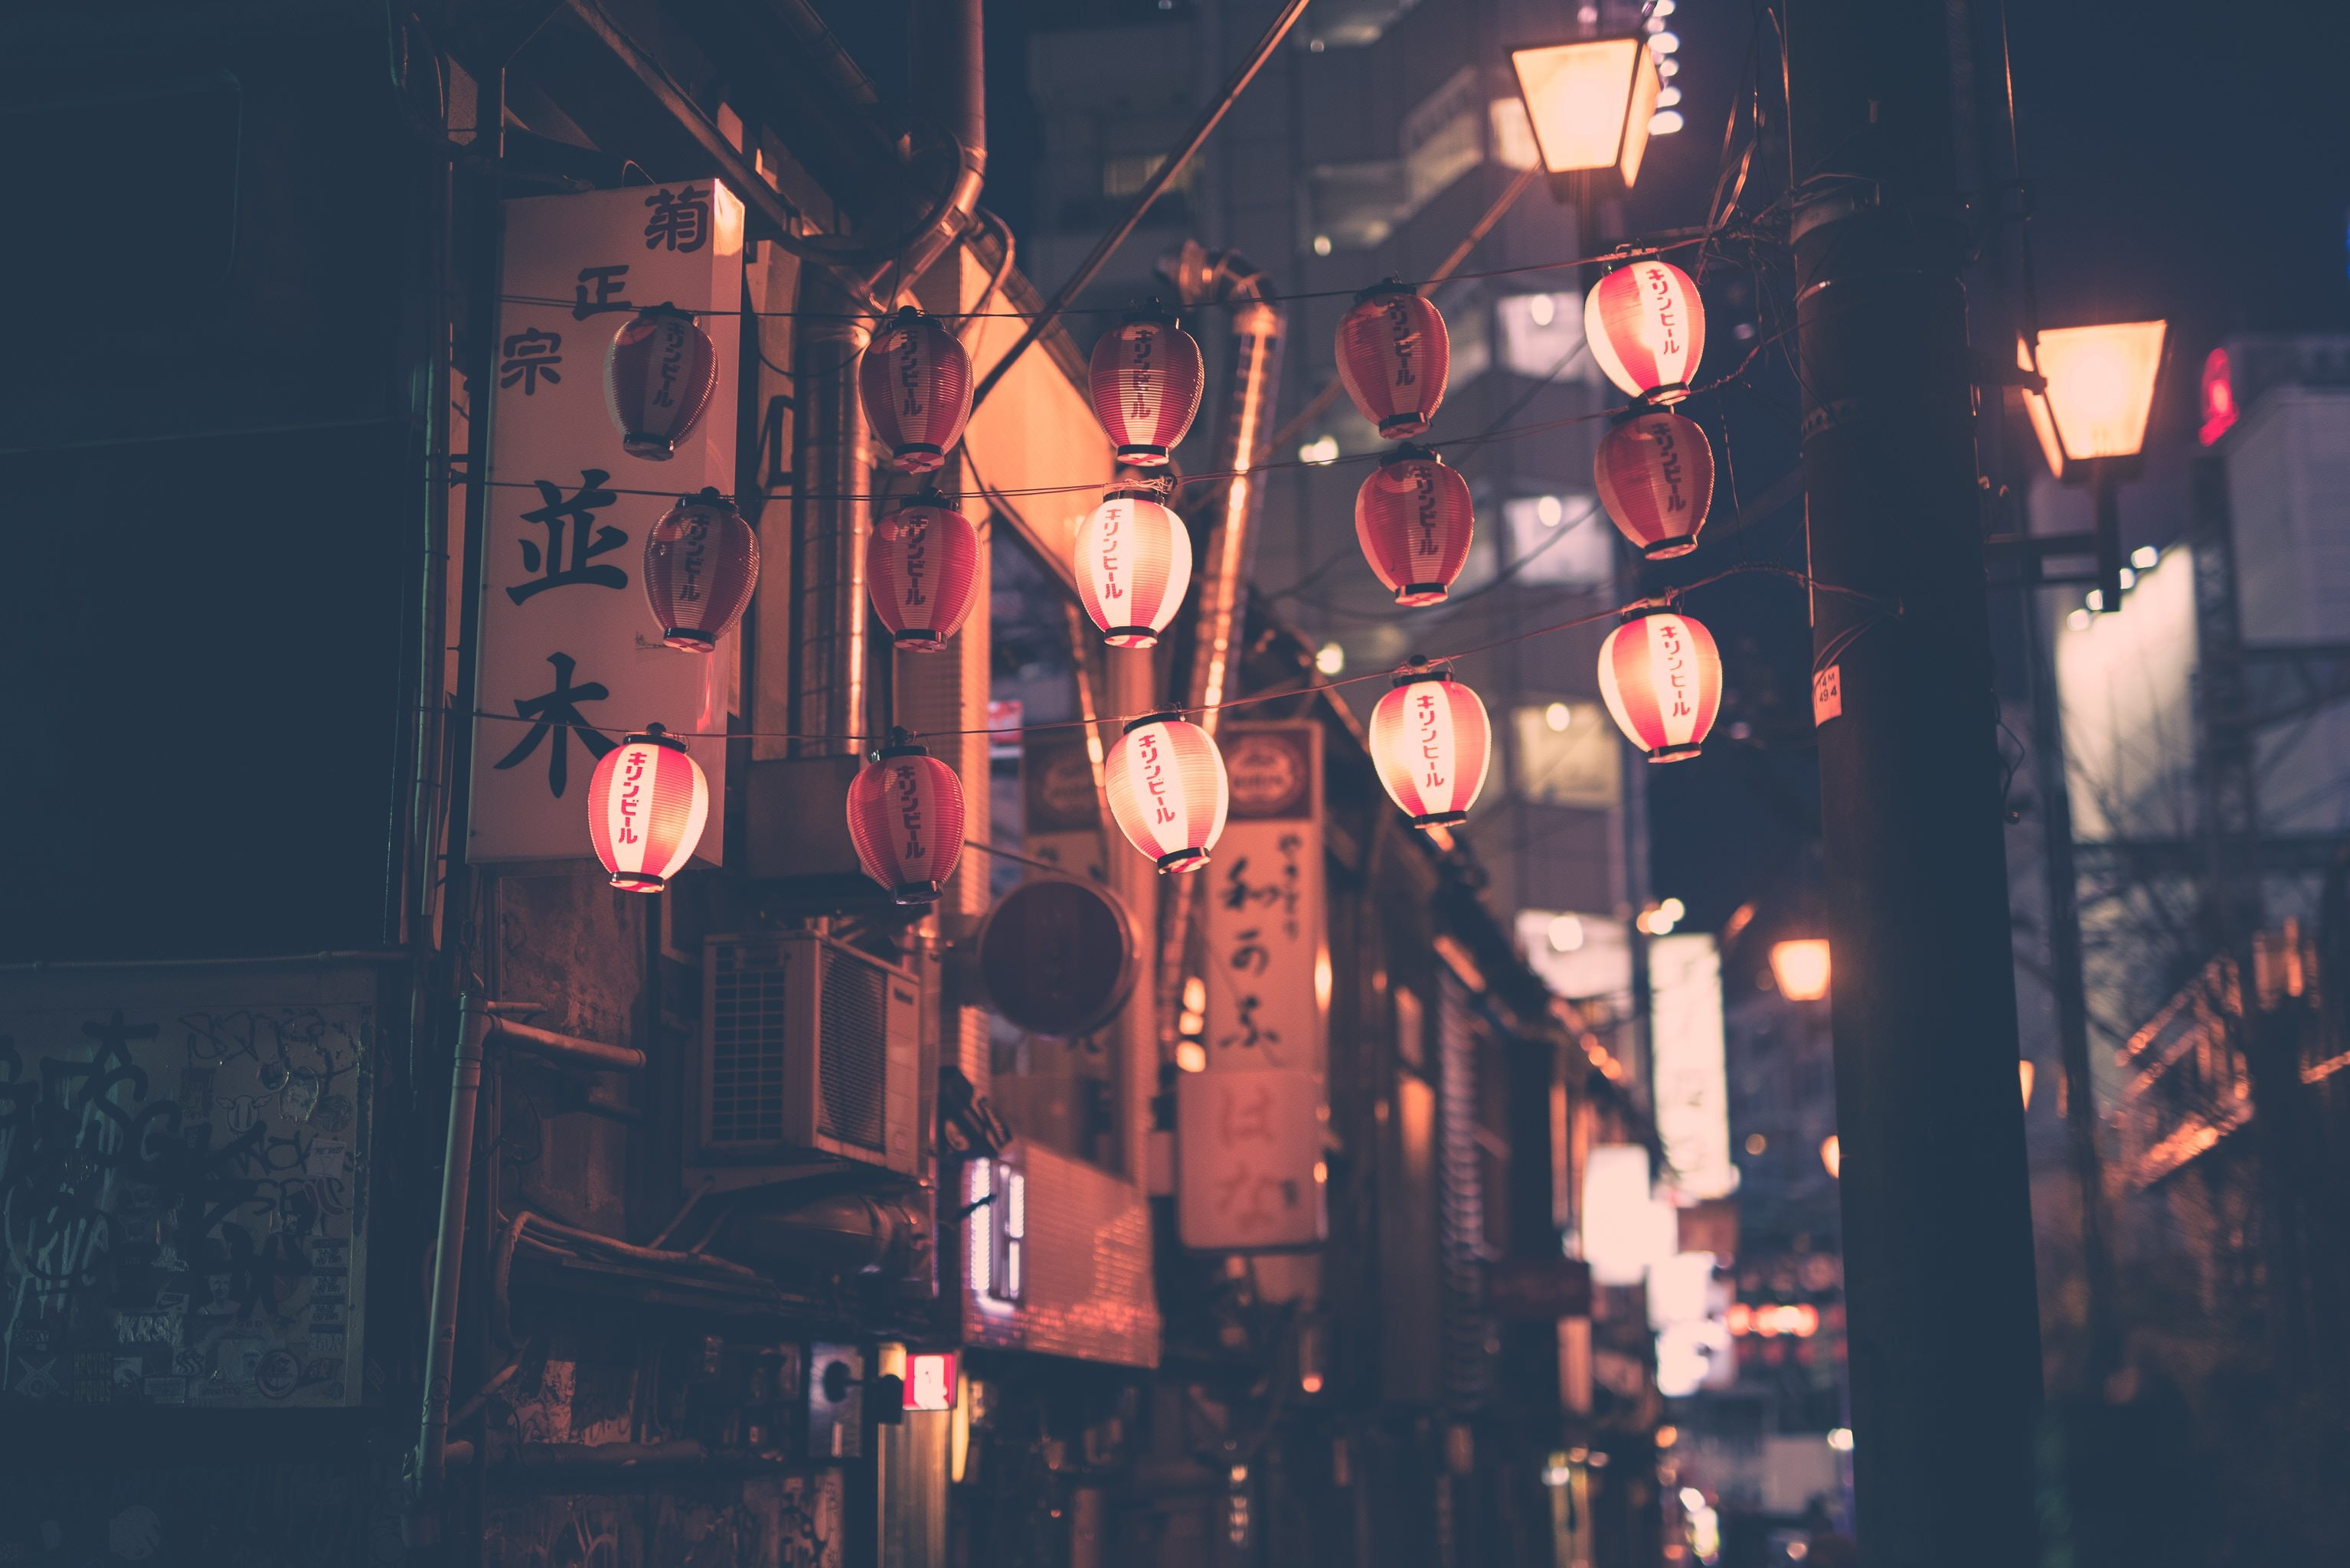 Turned On Street Light Free Stock Photo